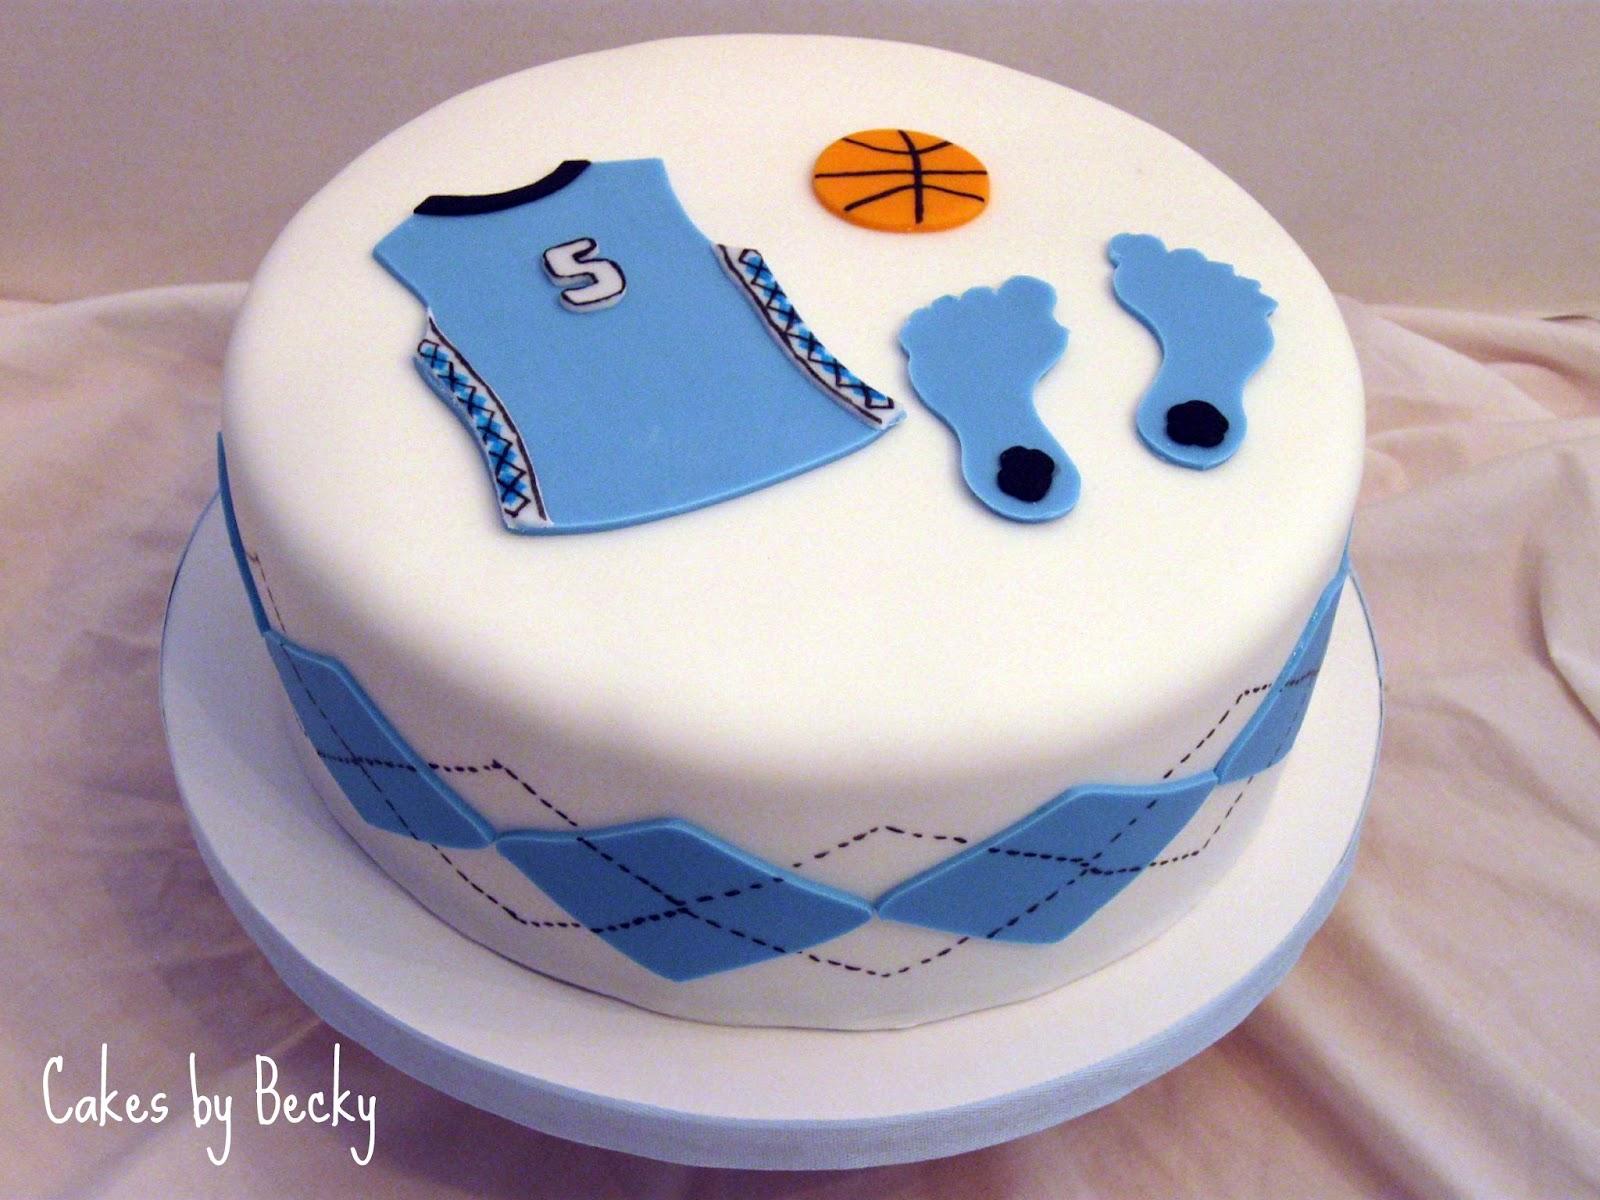 Cakes by Becky Carolina Tarheels Basketball Birthday Cake